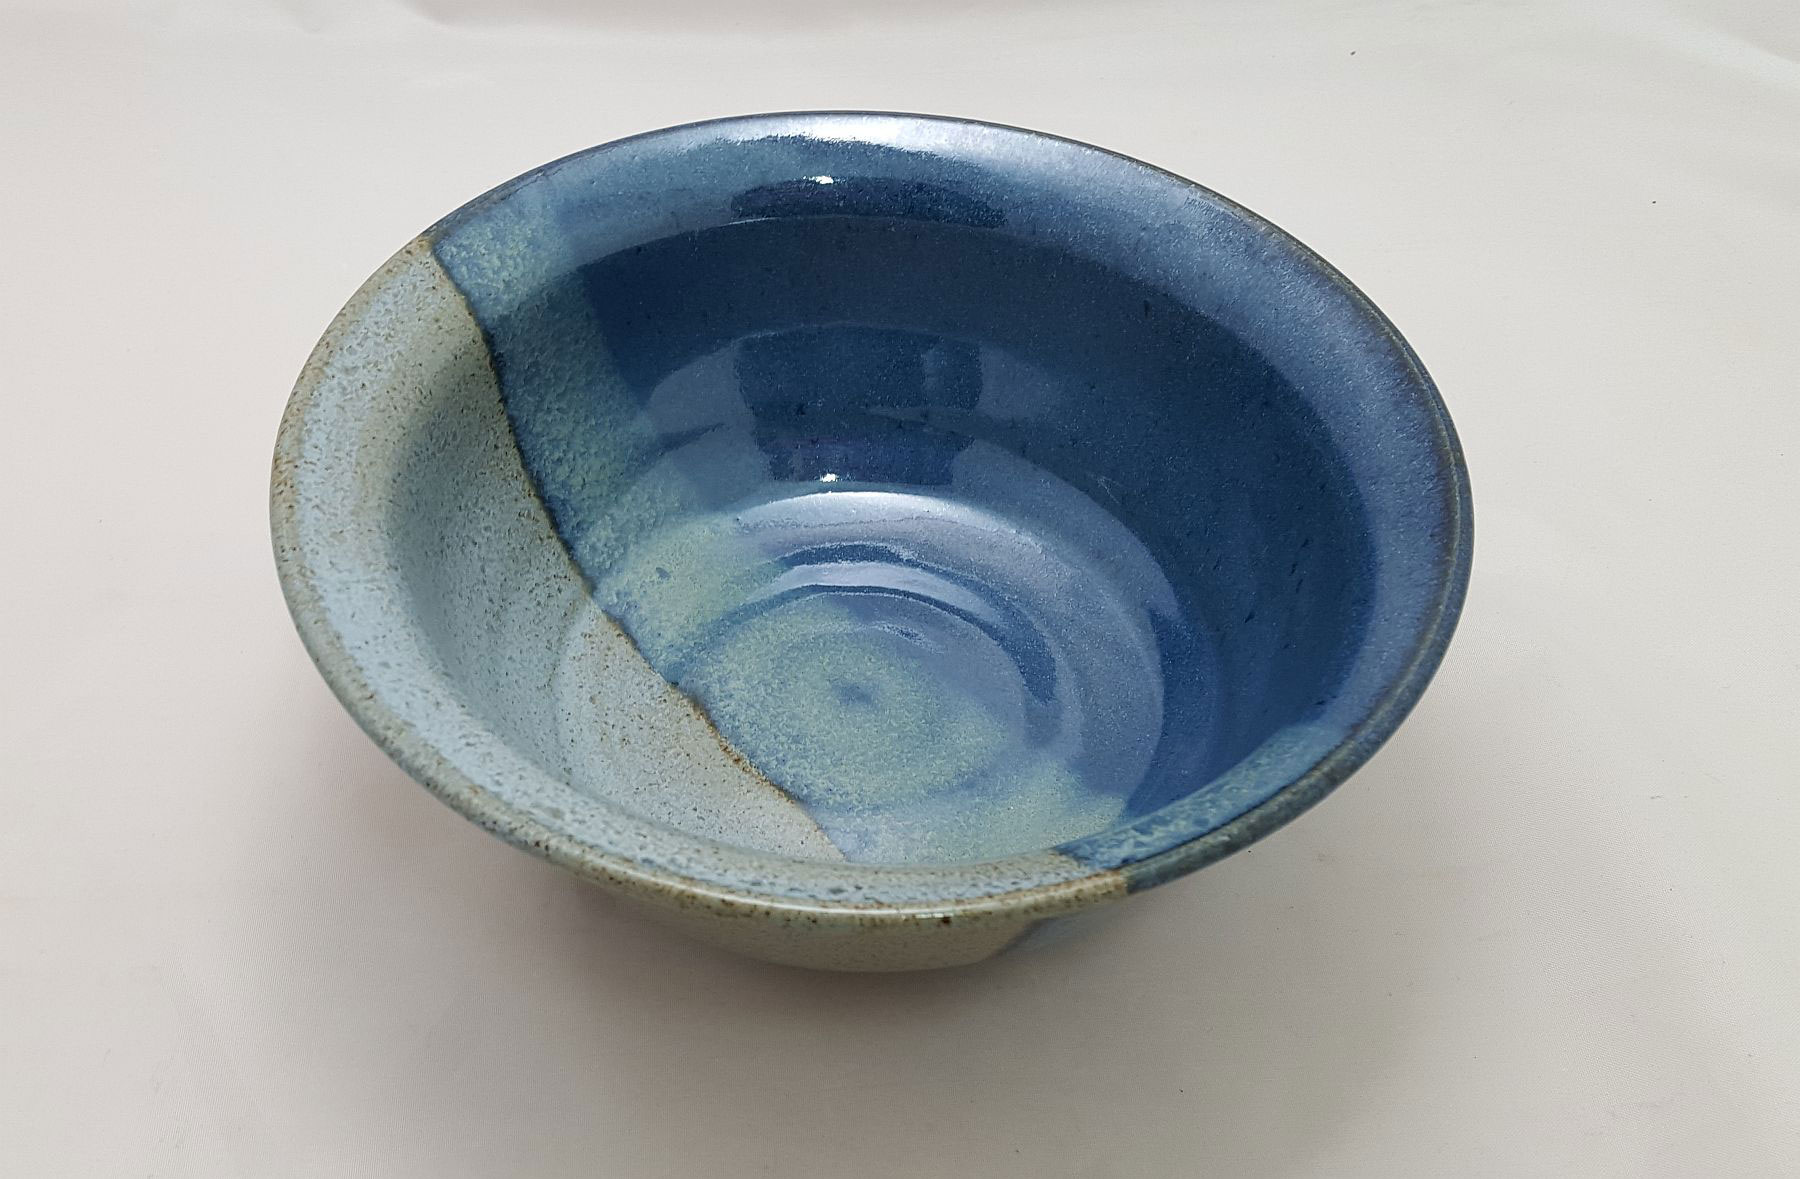 Stoneware bowl in blue duo glaze.